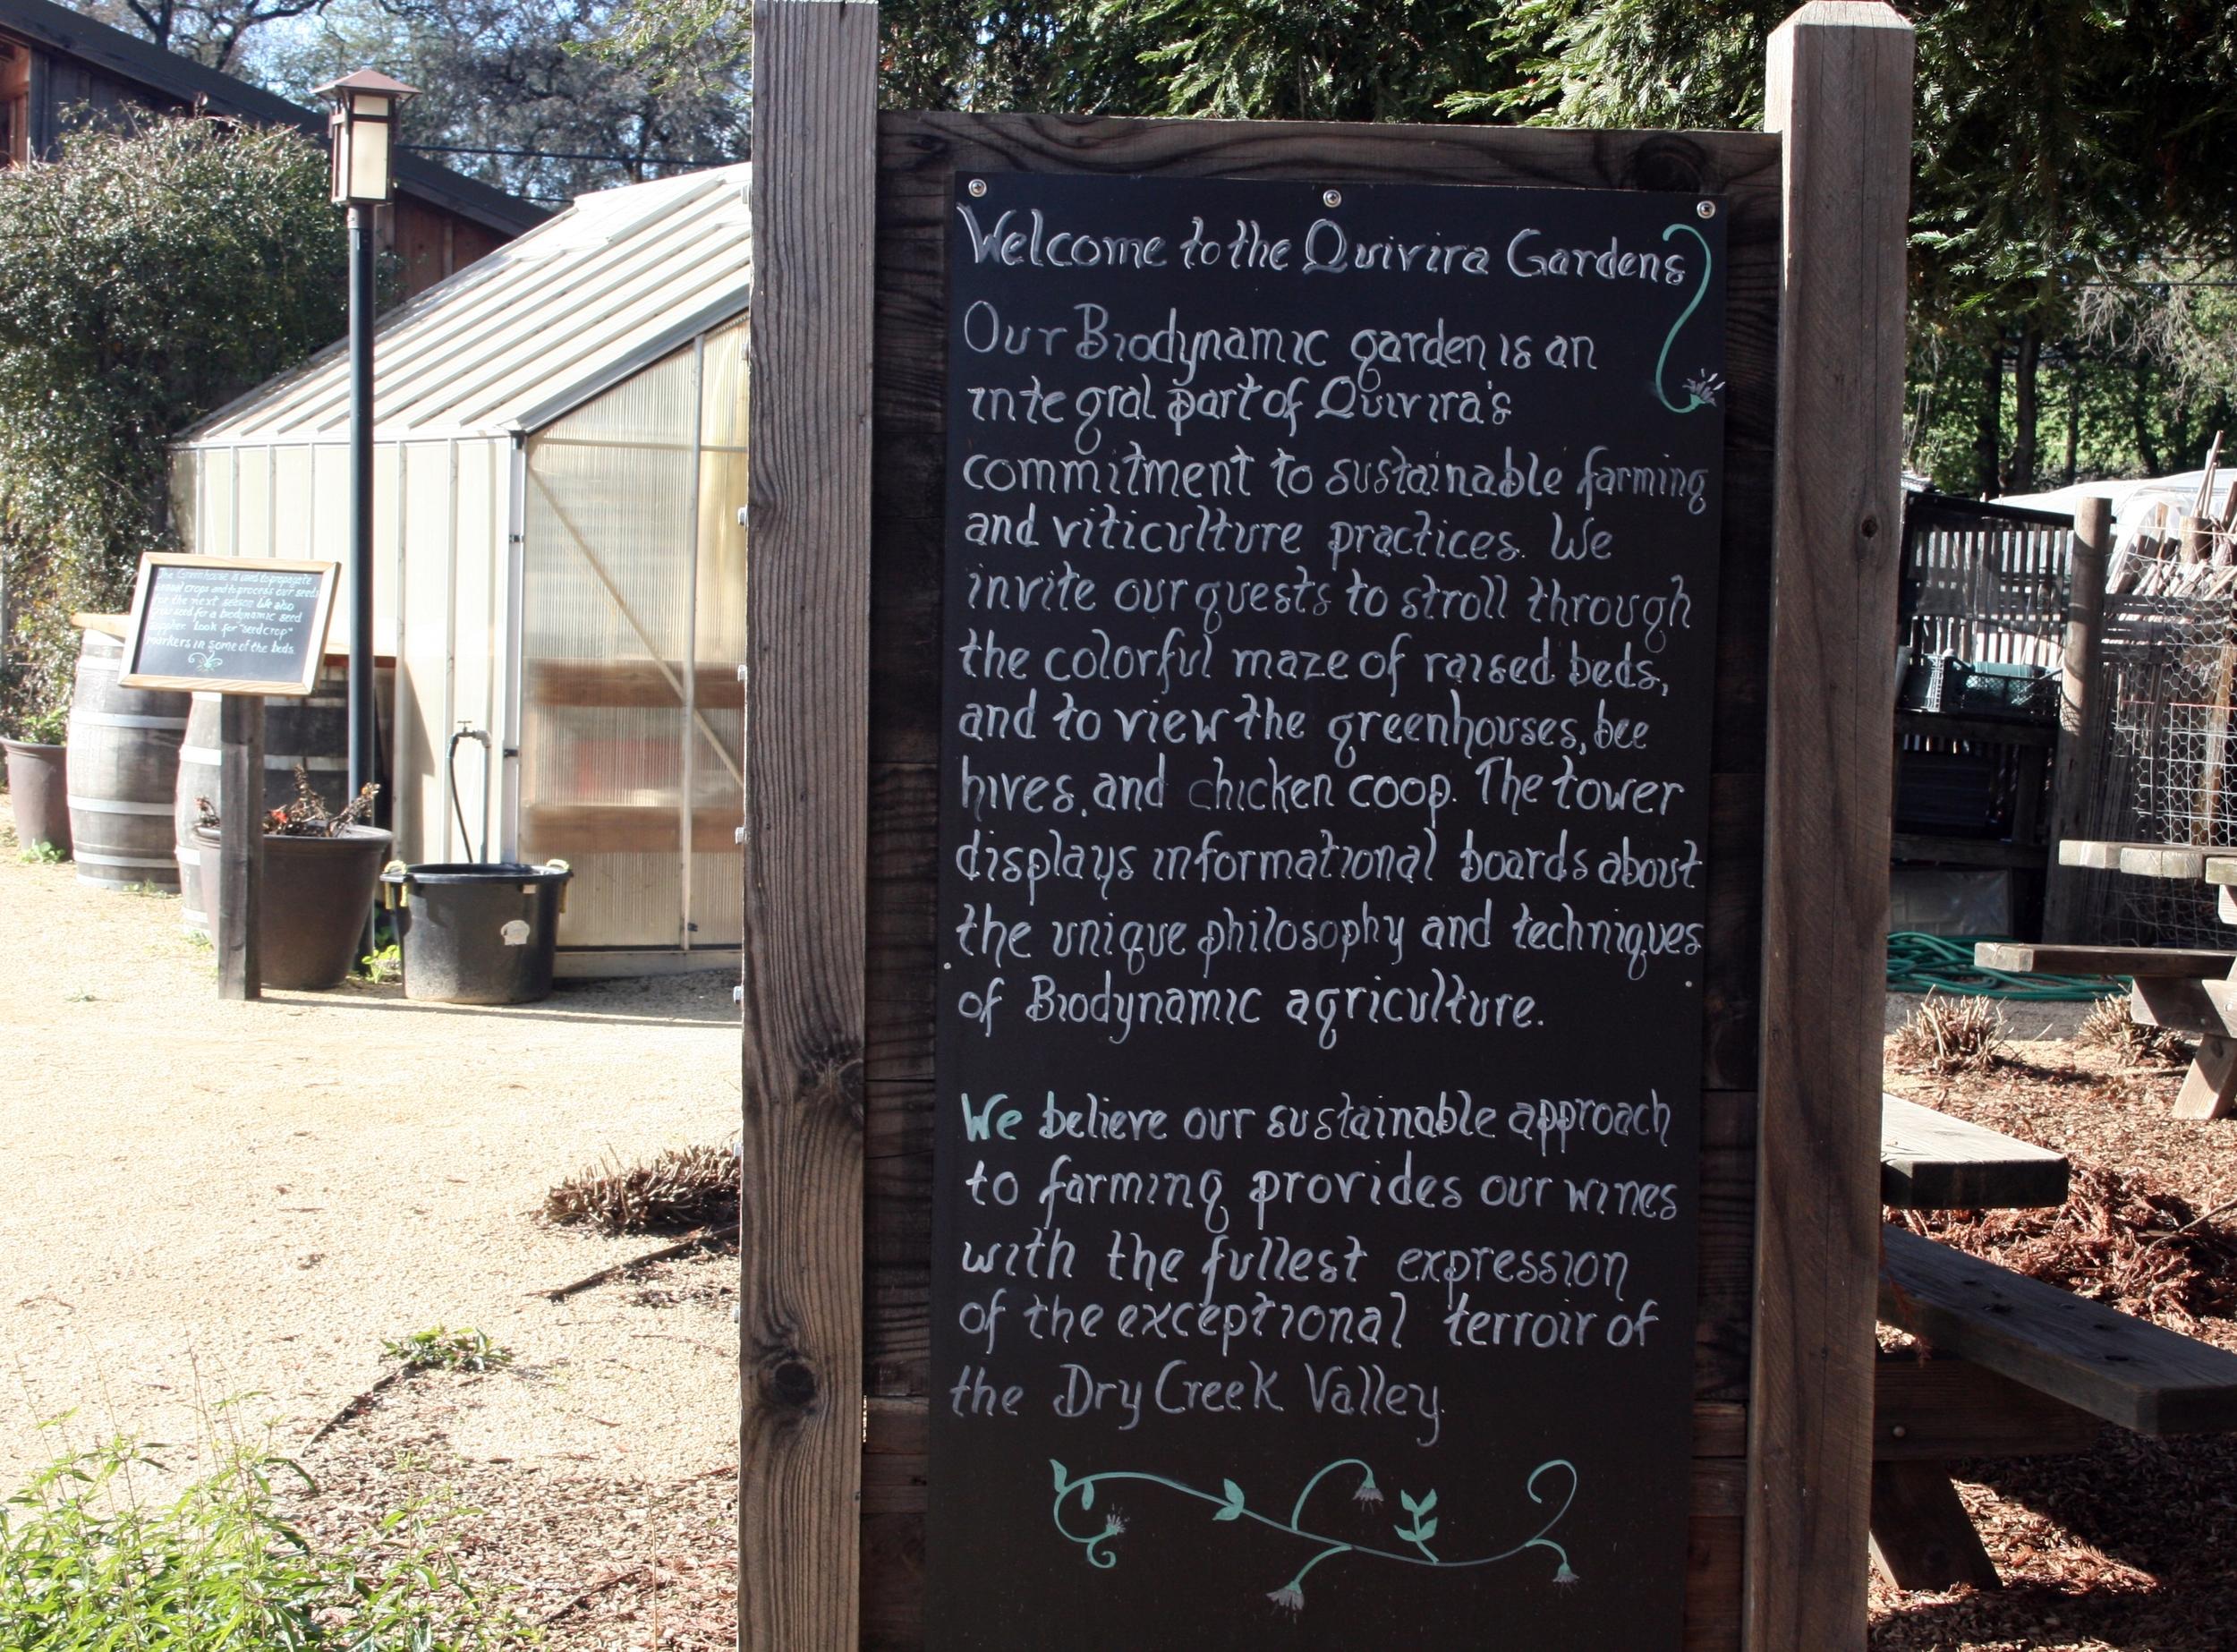 Quivira gardens in Healdsburg, CA